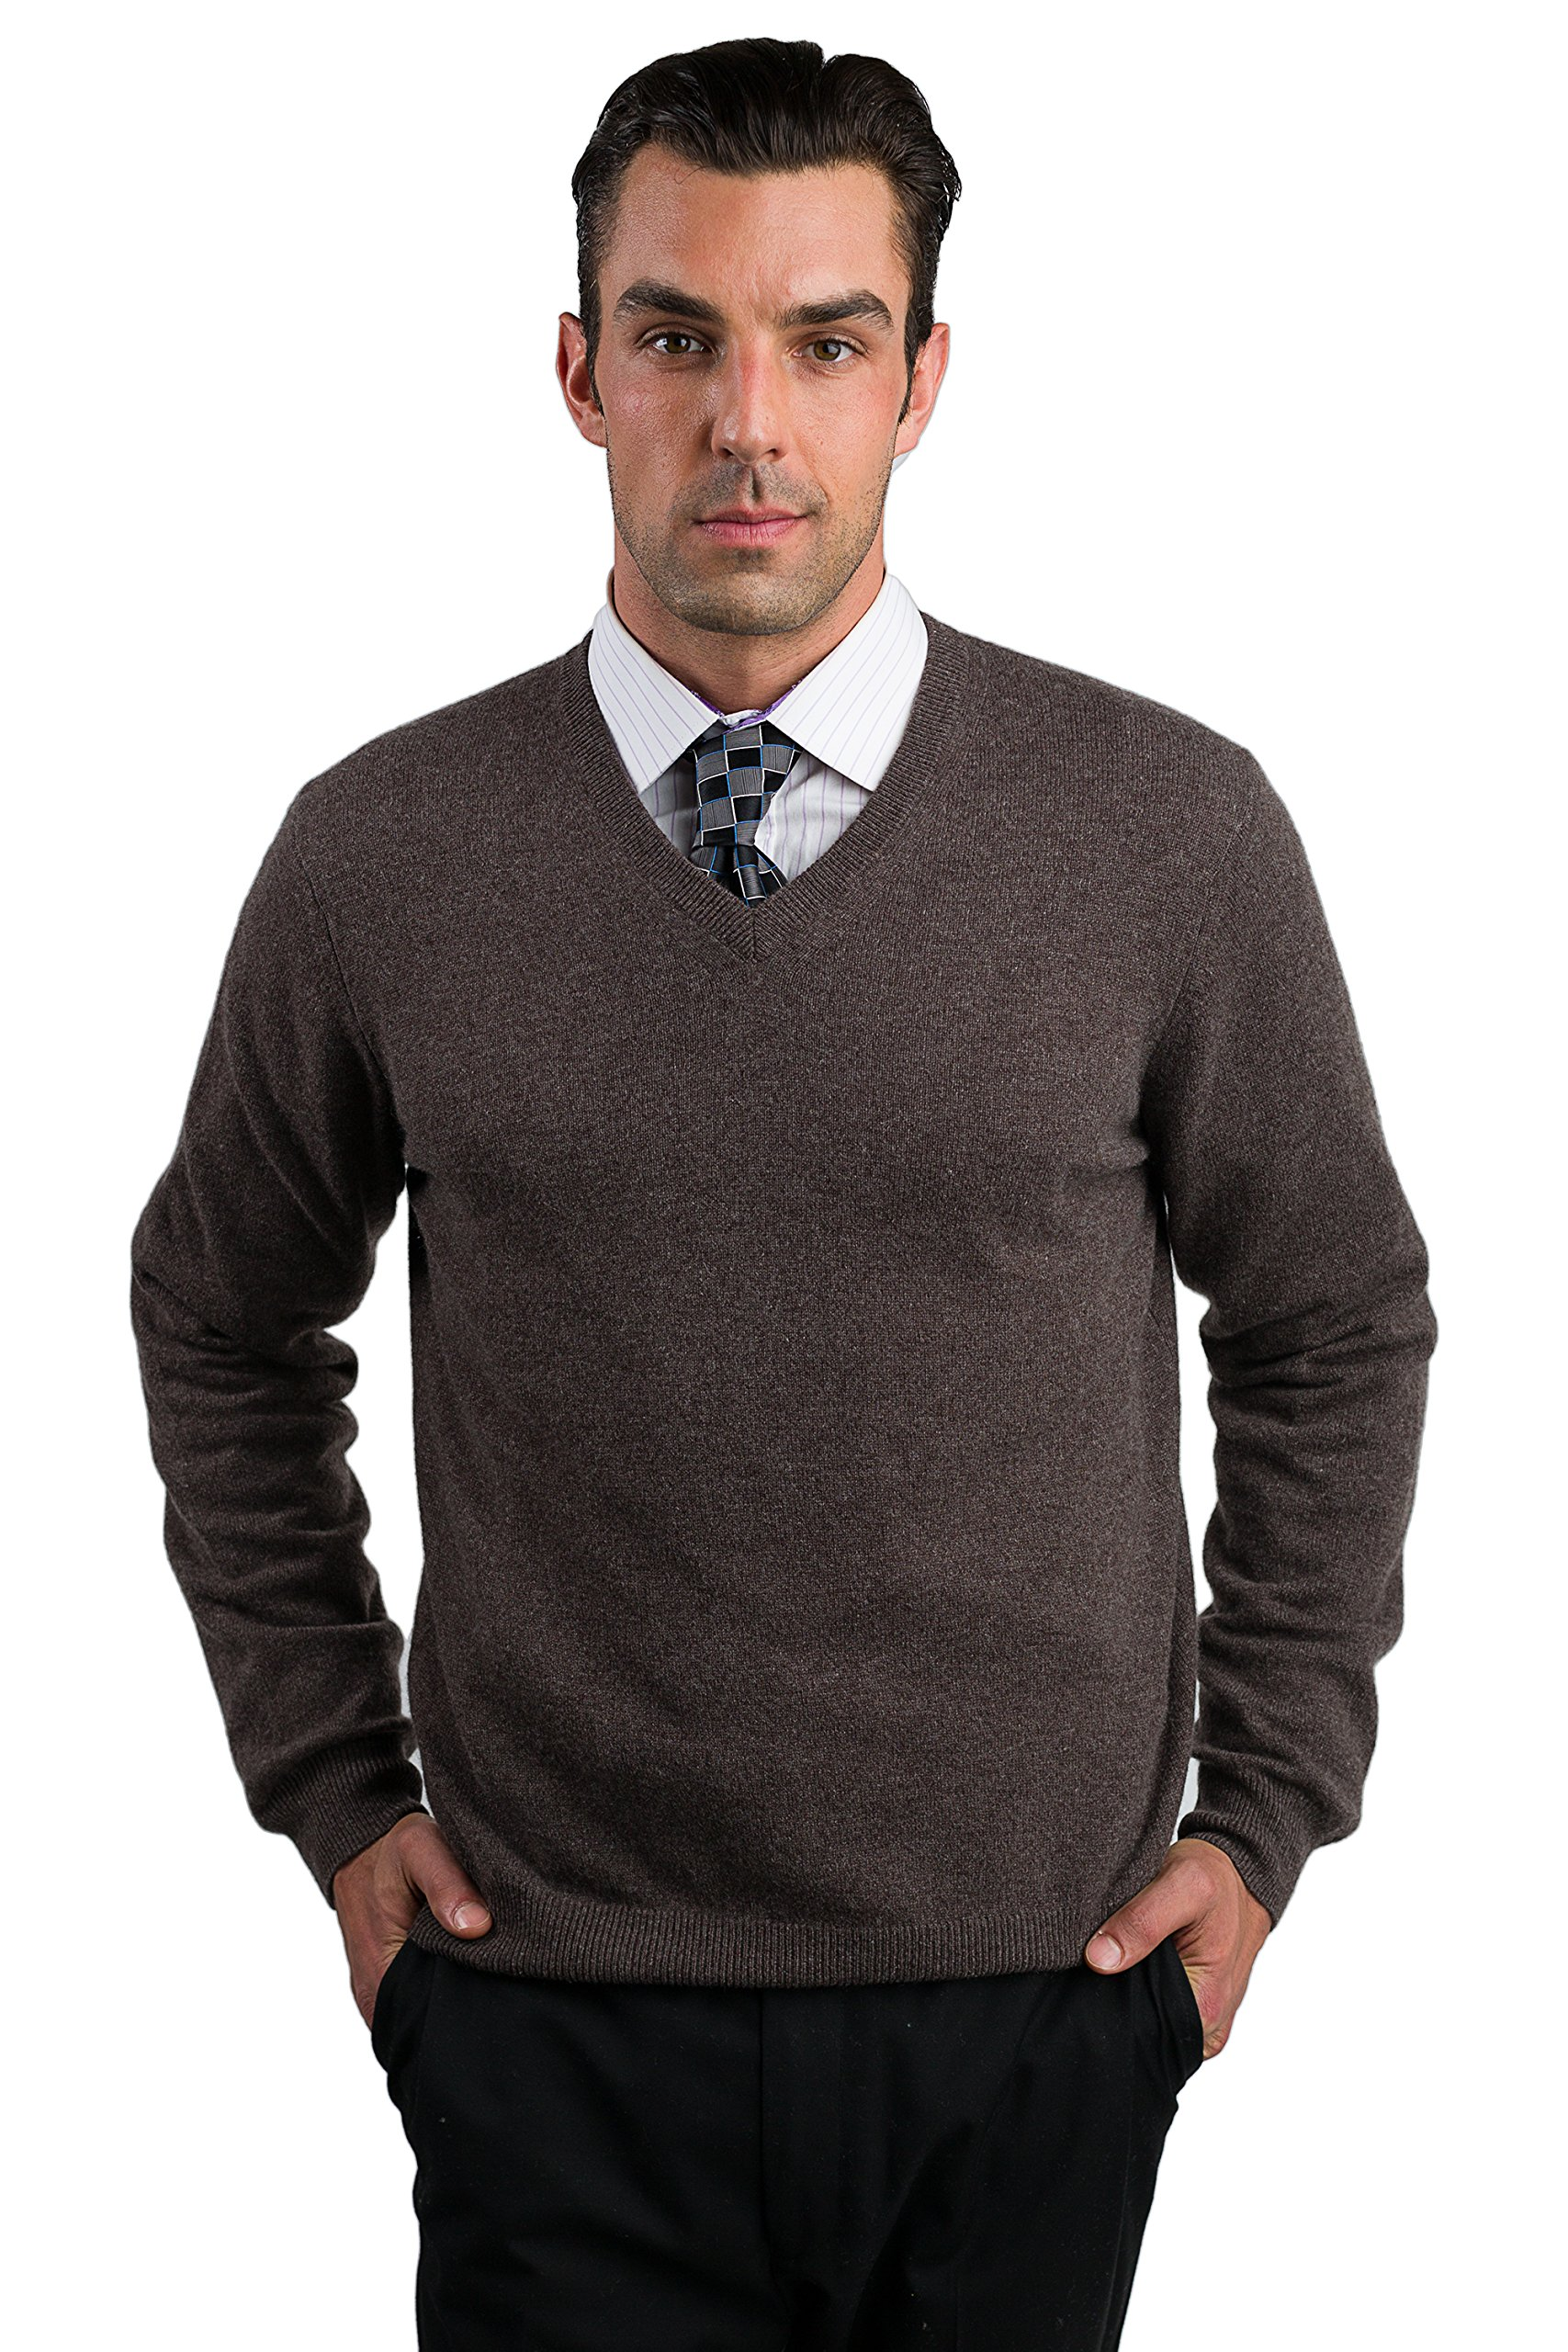 JENNIE LIU Men's 100% Cashmere Long Sleeve V Neck Sweater (Medium, Brown)